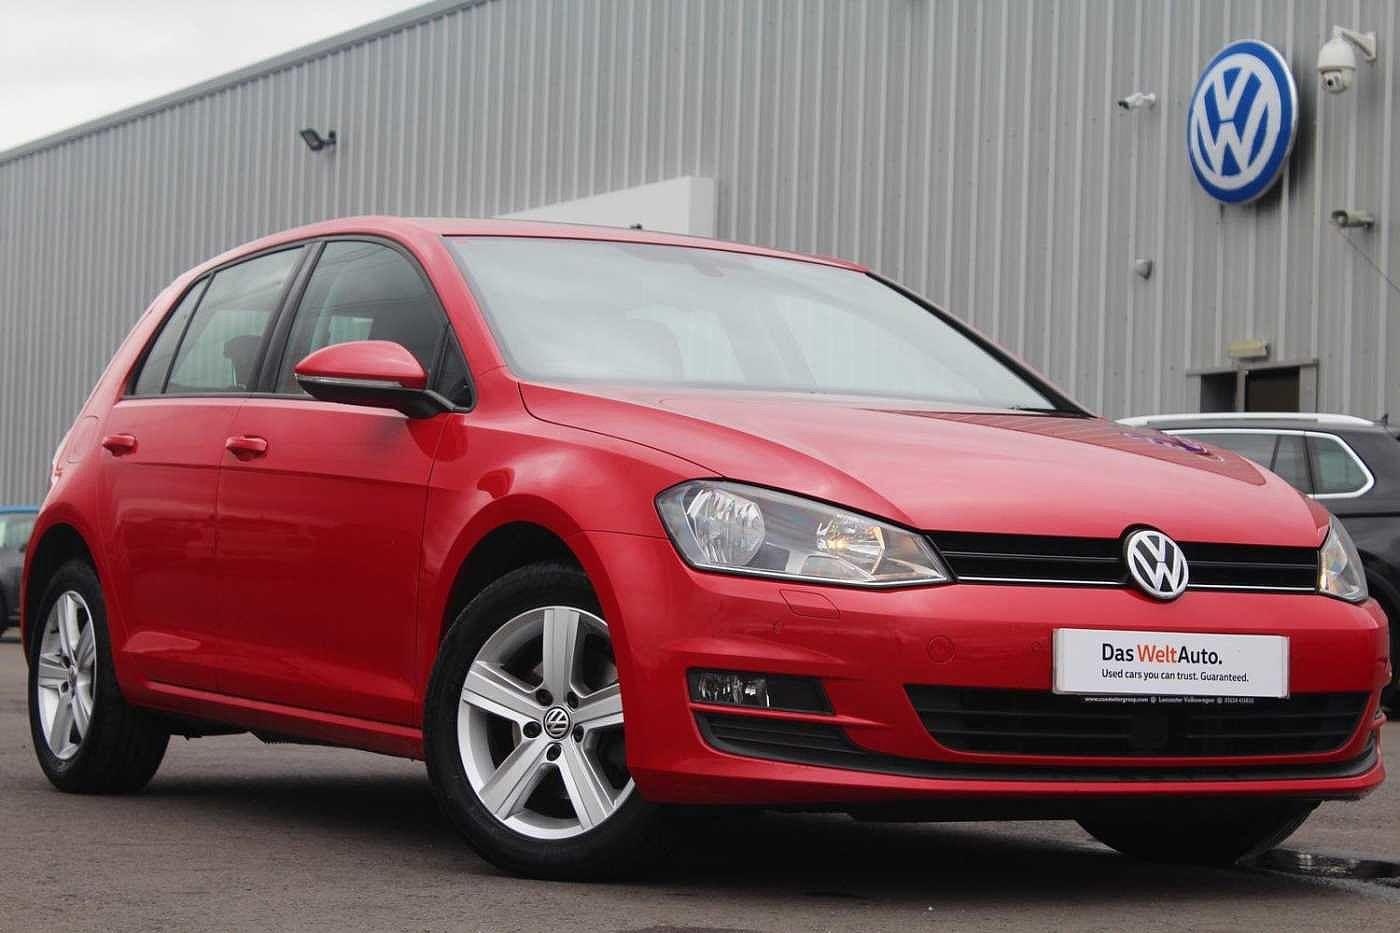 Volkswagen Golf 1.6 TDI Match Edition (110PS) DSG 5-Dr